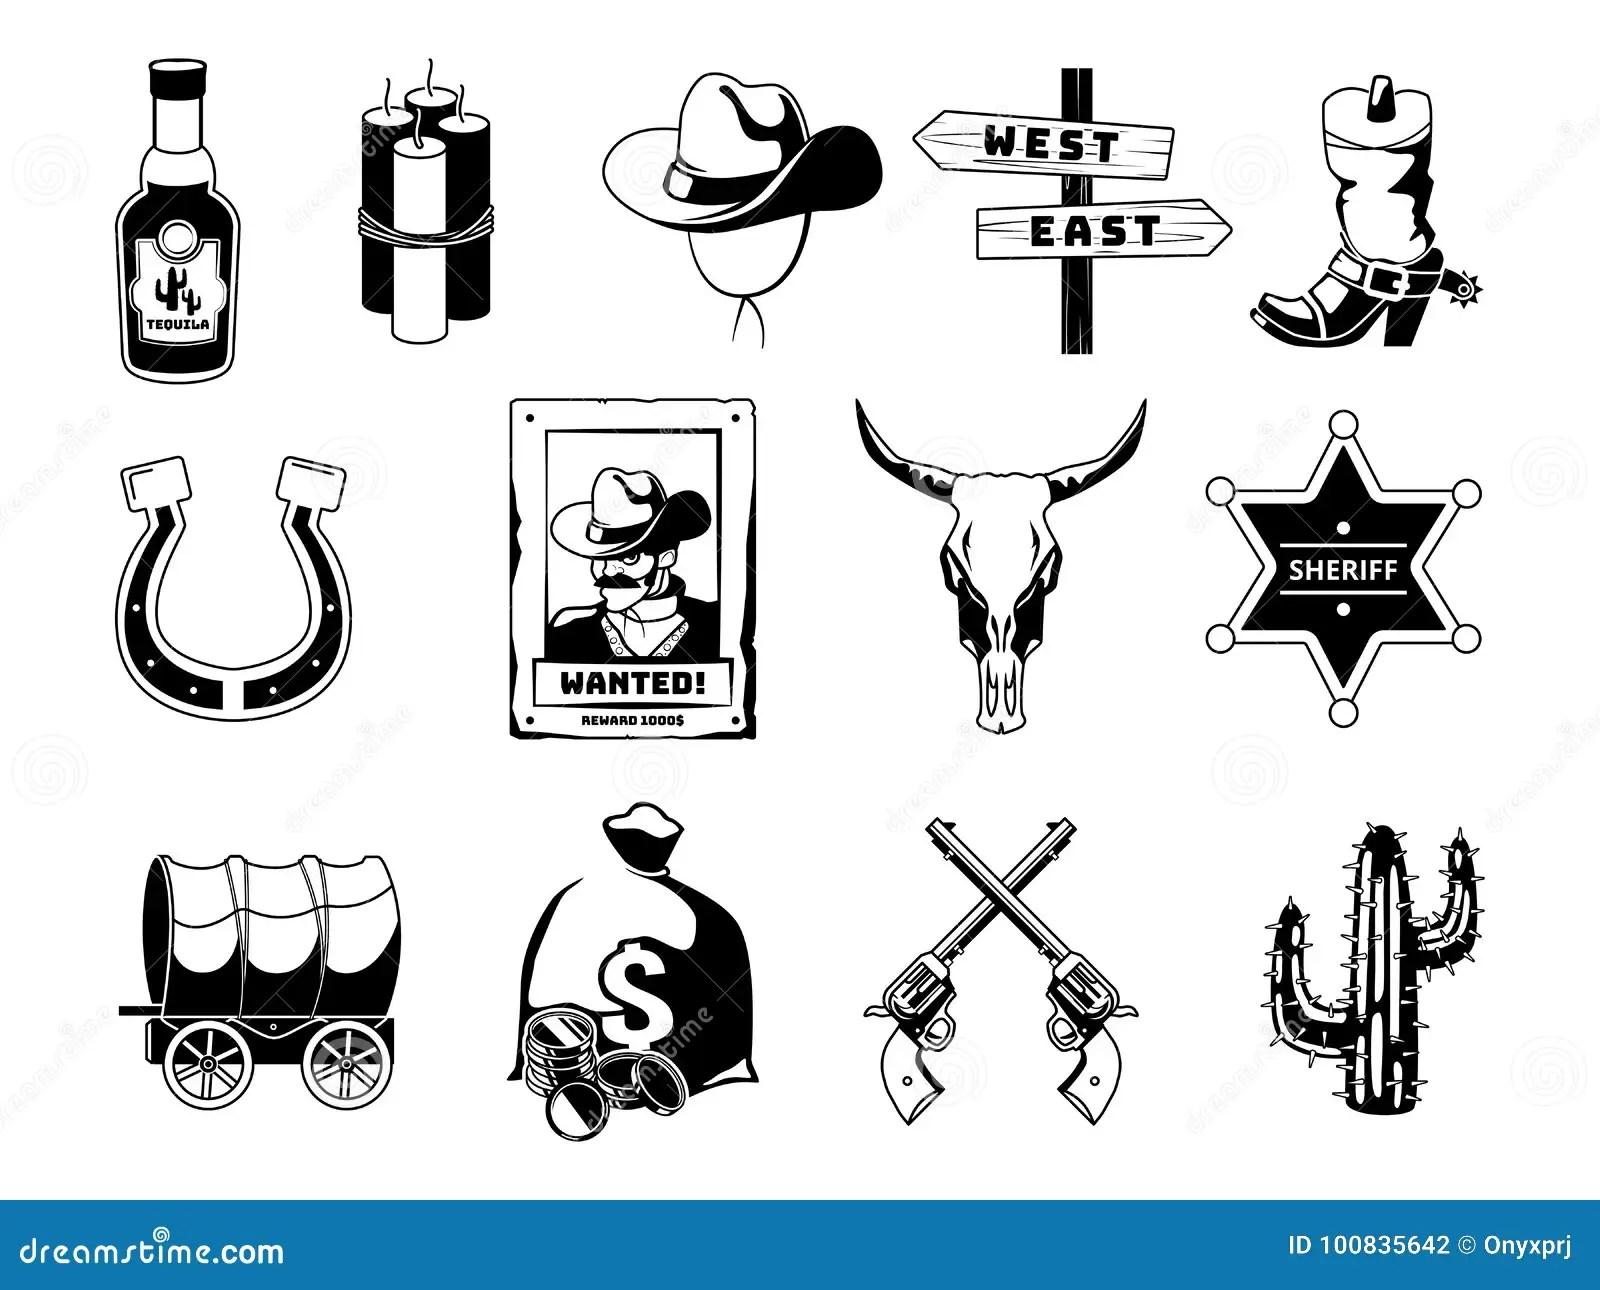 Monochrome Black Illustrations Theme Of Wild West Cowboy